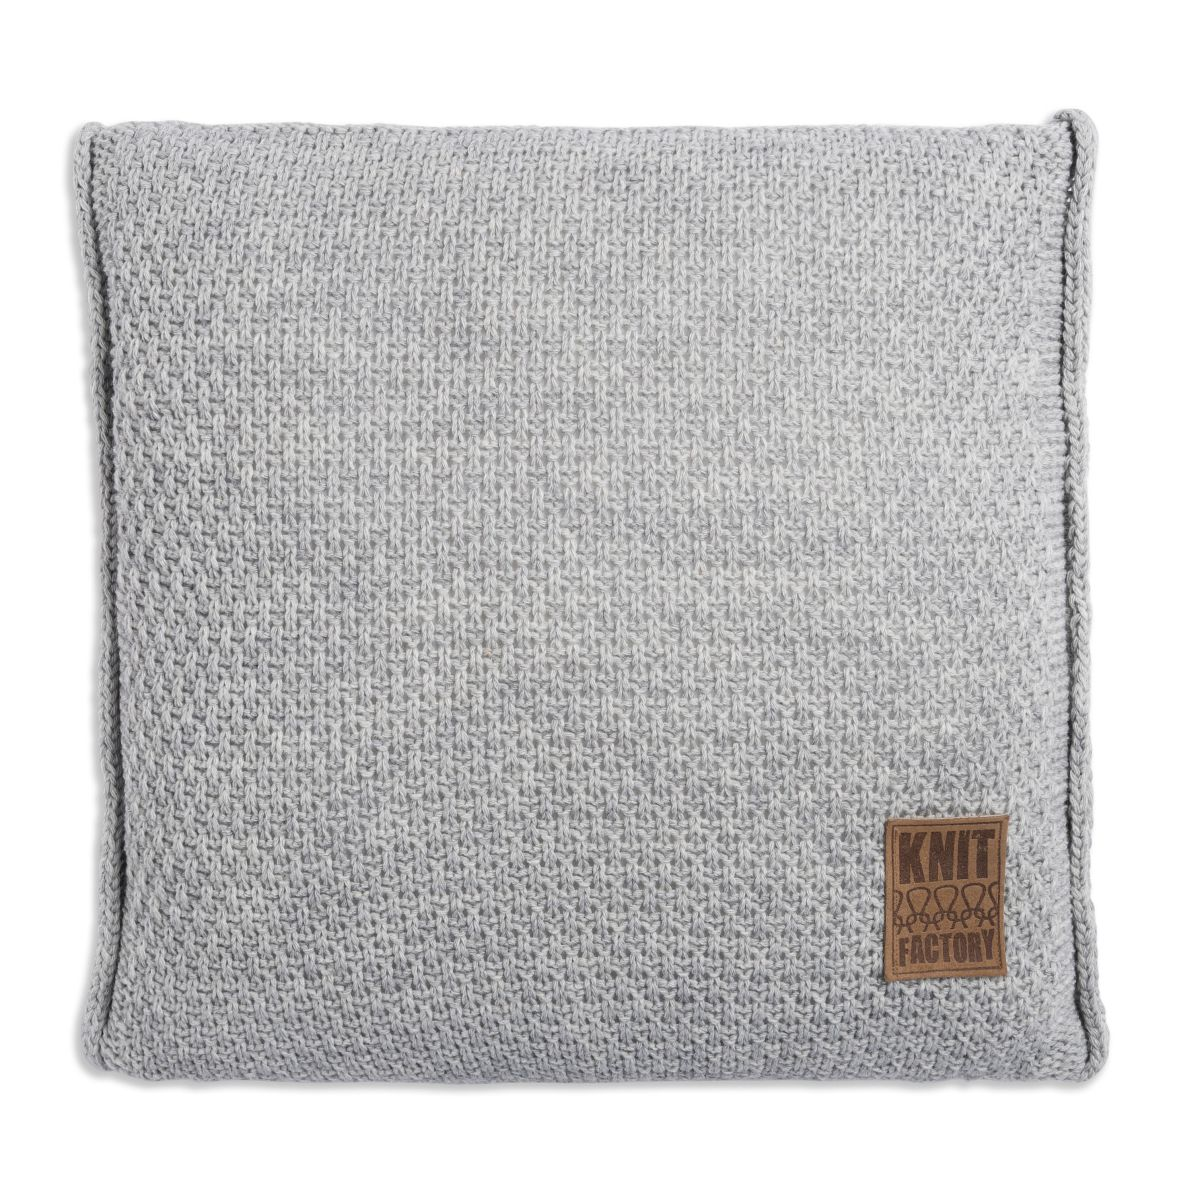 knit factory 1091211 kussen 50x50 jesse licht grijs1